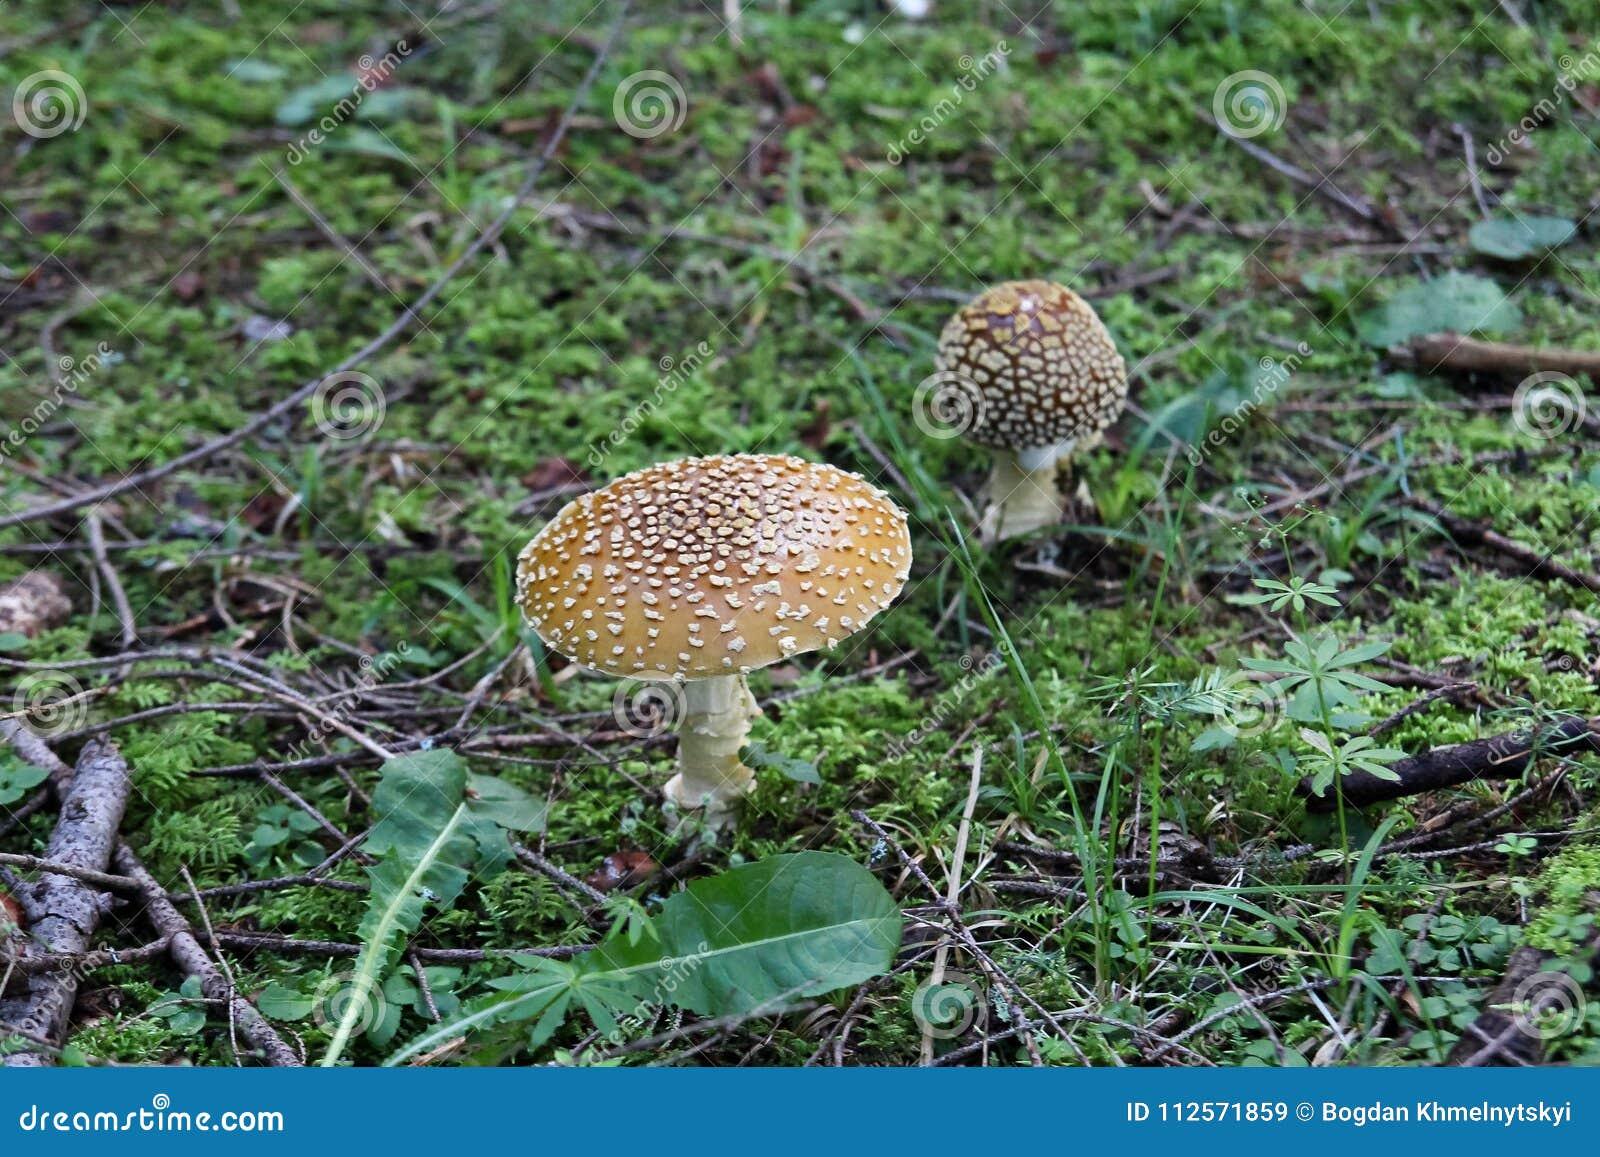 Twee vreemde paddestoelen groeien ter plaatse behandeld met klein groen gras in het bos